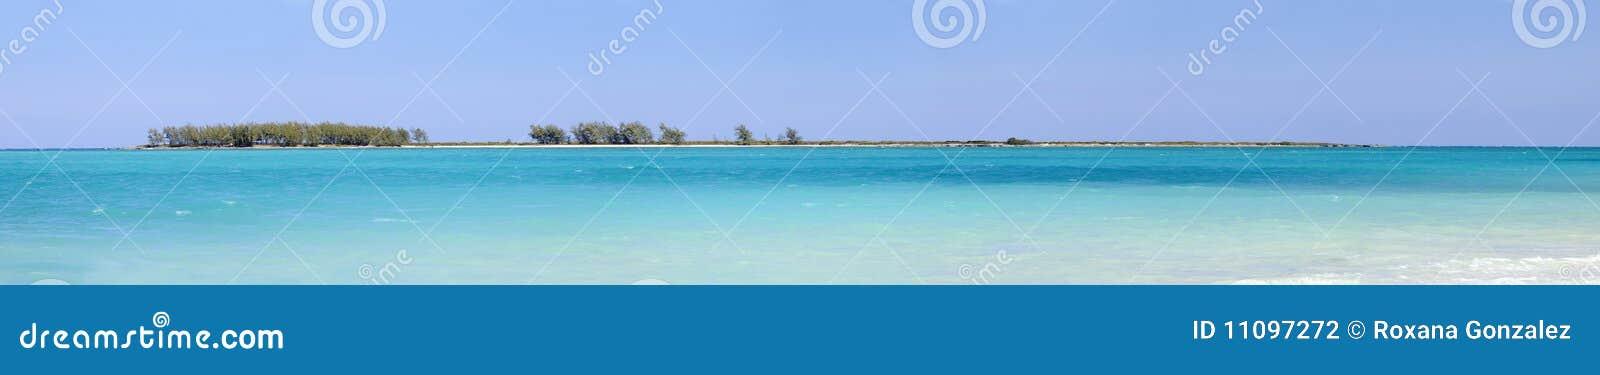 Plażowa cayo coco Cuba panorama